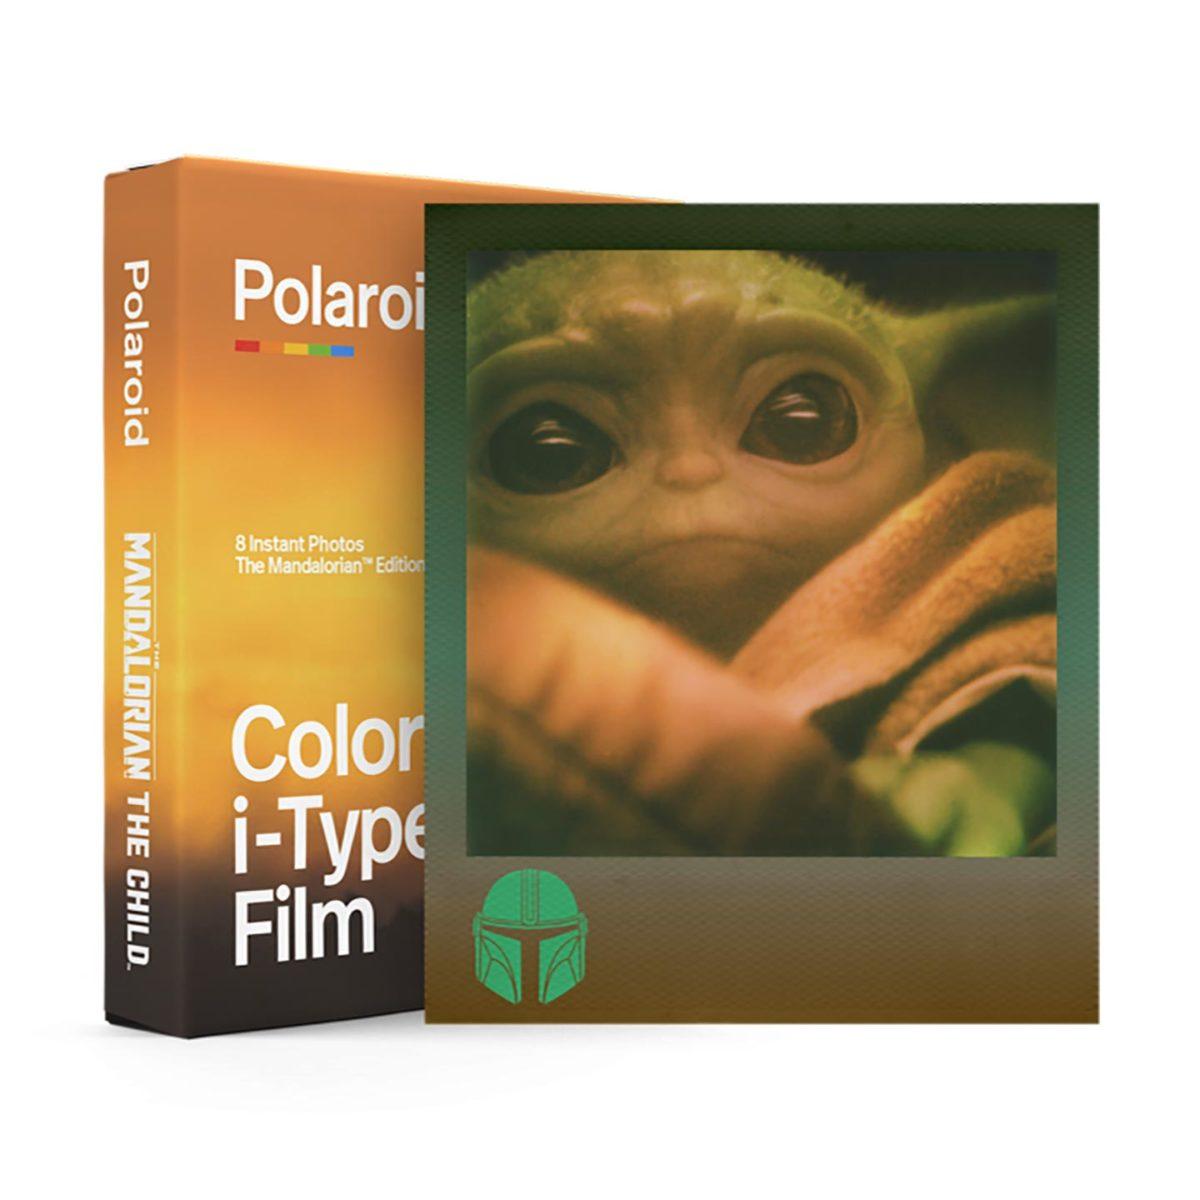 polaroid_i_type_color_film_the_mandalorian_01